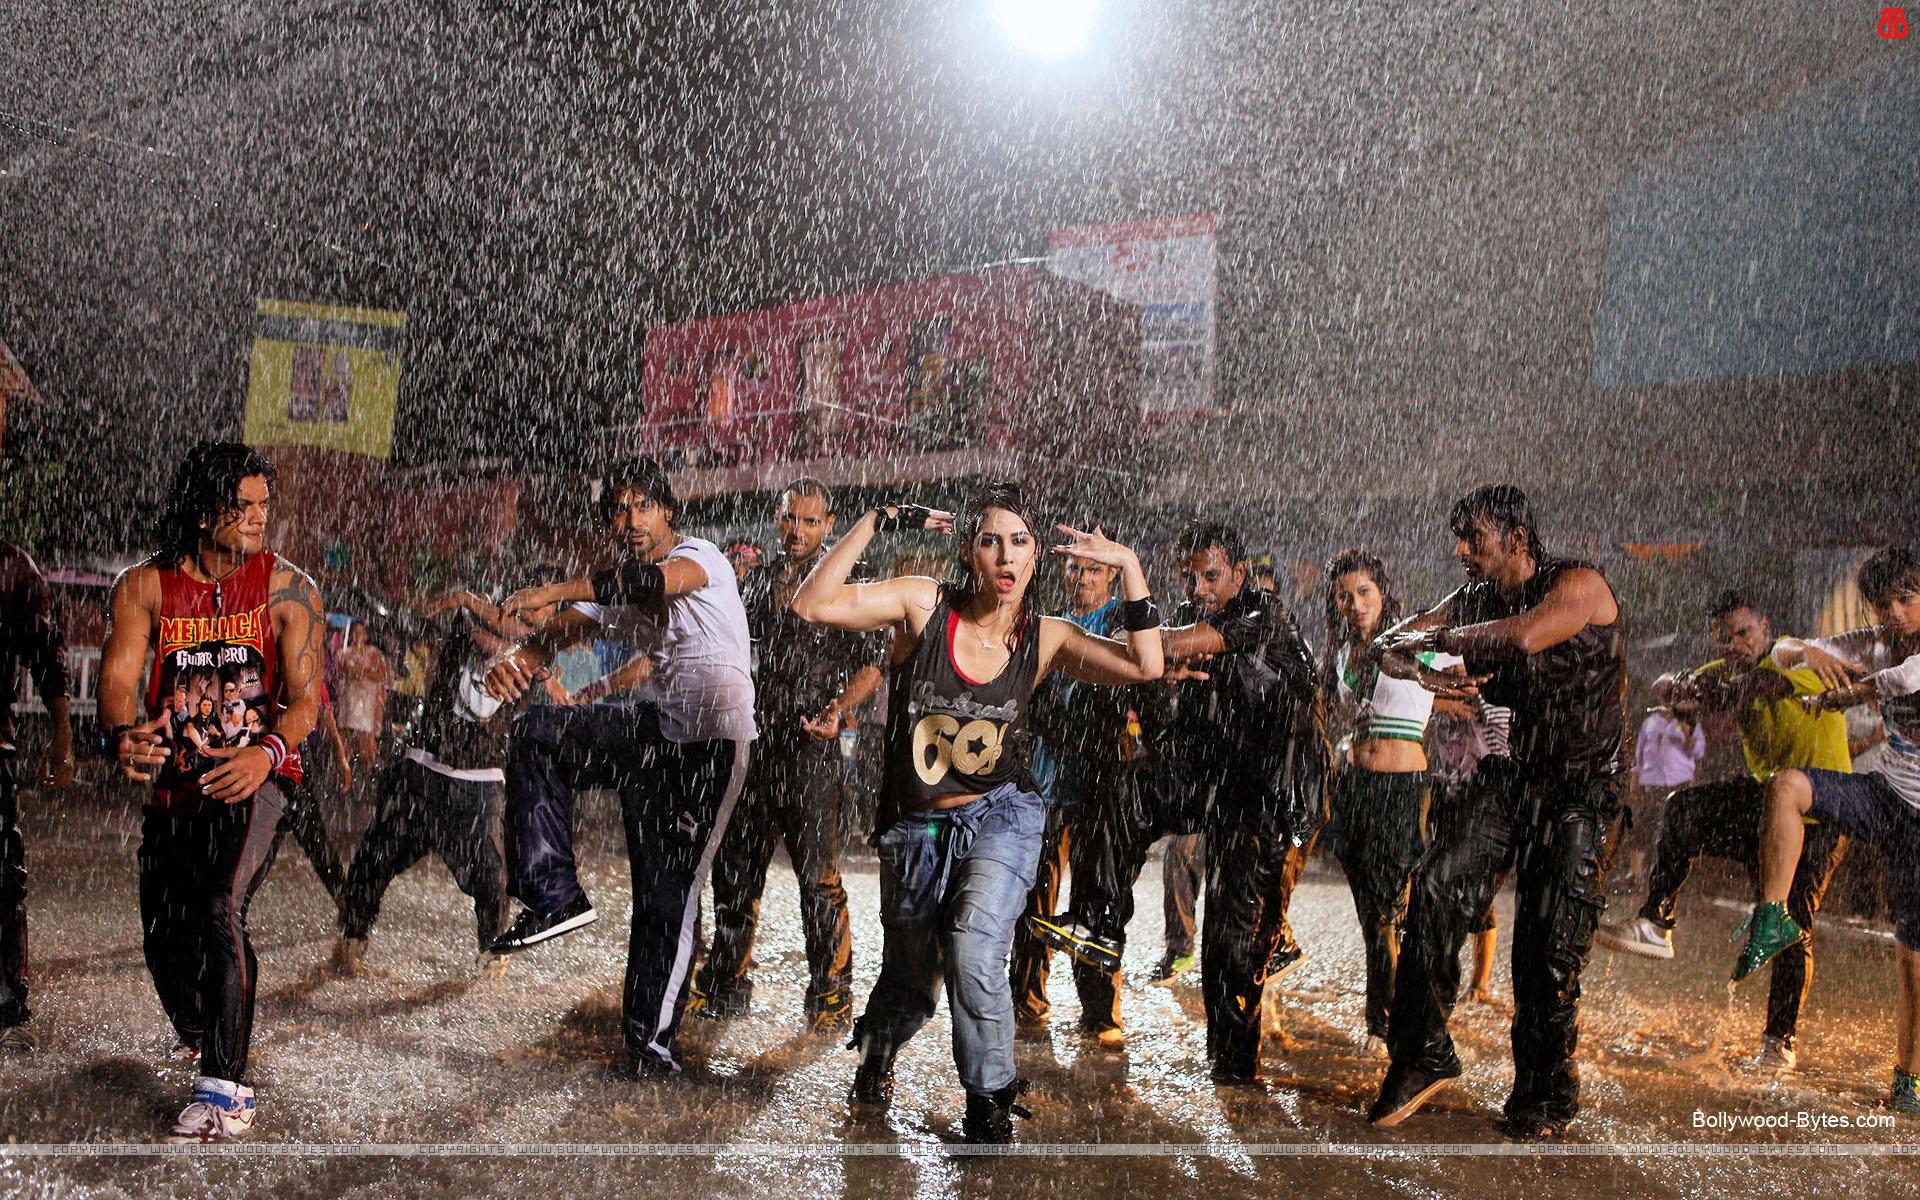 https://2.bp.blogspot.com/-xa600UKO3ng/URaDg_SfziI/AAAAAAAAasg/QwodqYX1VH0/s1920/ABCD-Any-Body-Can-Dance-++Hot-Lauren-Gottlieb-Salman-Yusuff-Khan-Deharmesh-Yeland -HD-Wallpaper-12.jpg